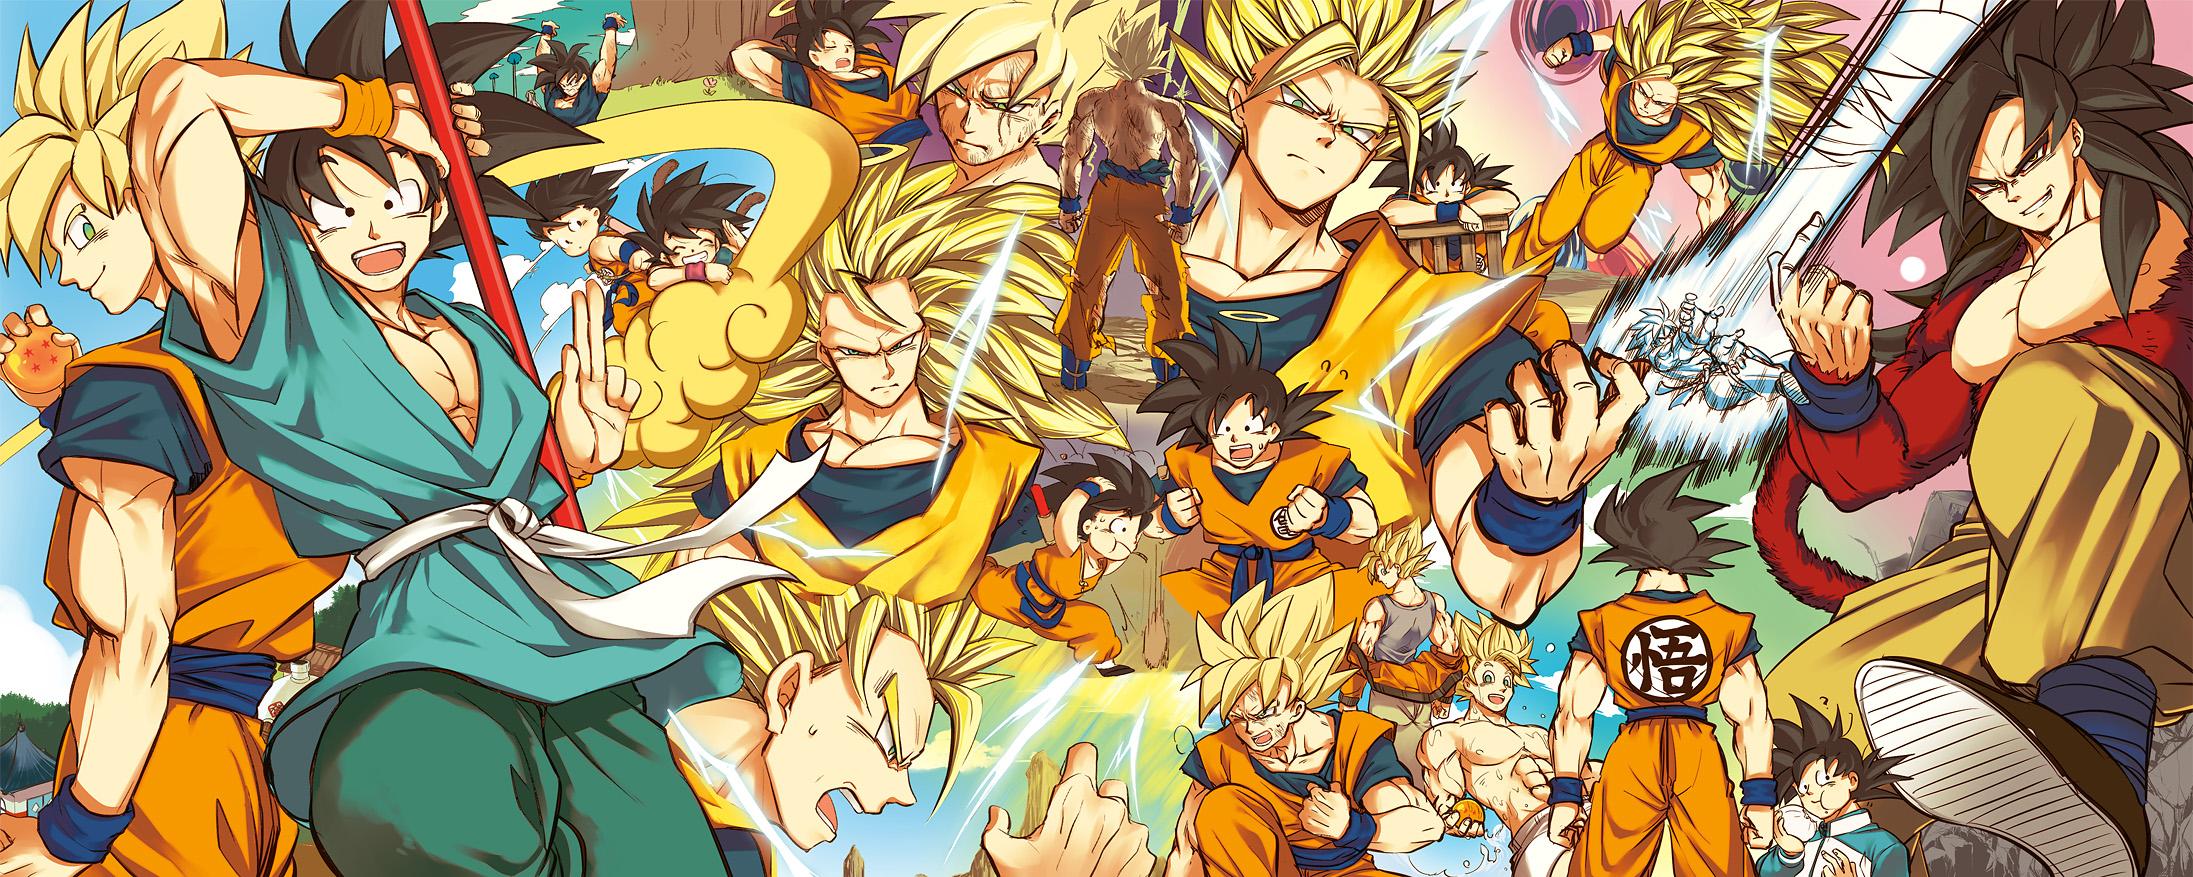 Dbz Dual Screen Wallpapers: Son Goku (DRAGON BALL)/#1758872